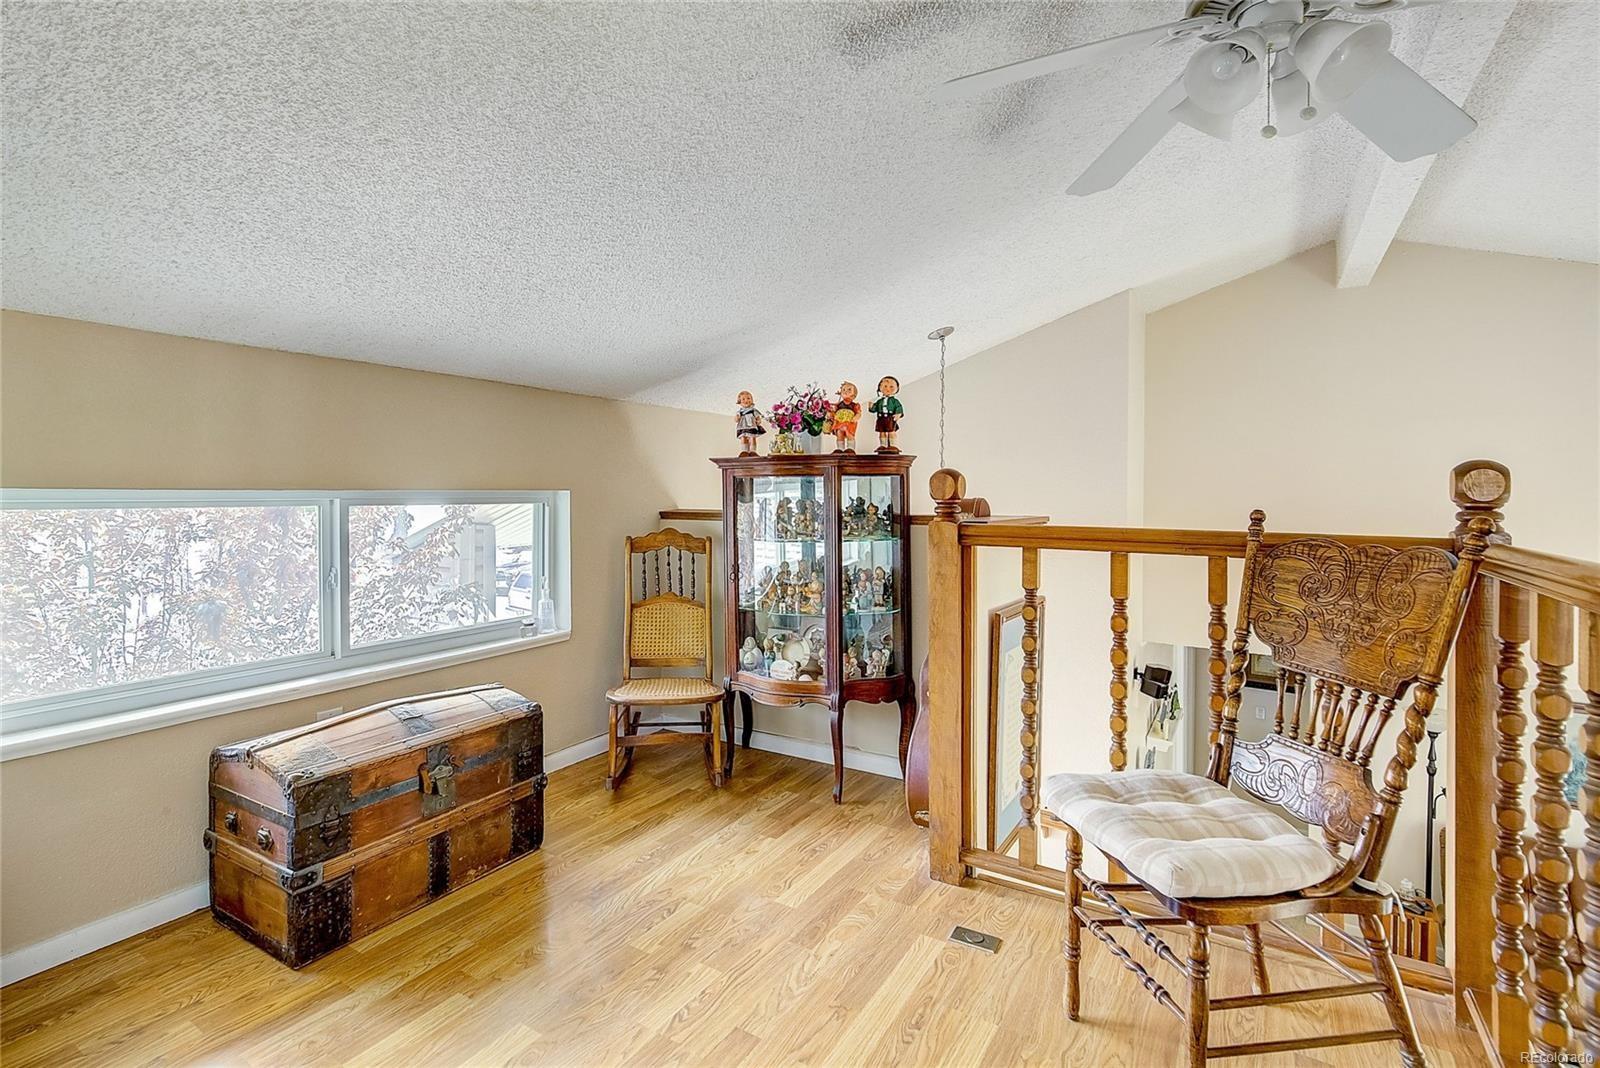 MLS# 1600759 - 1 - 12621  W Dakota Drive, Lakewood, CO 80228